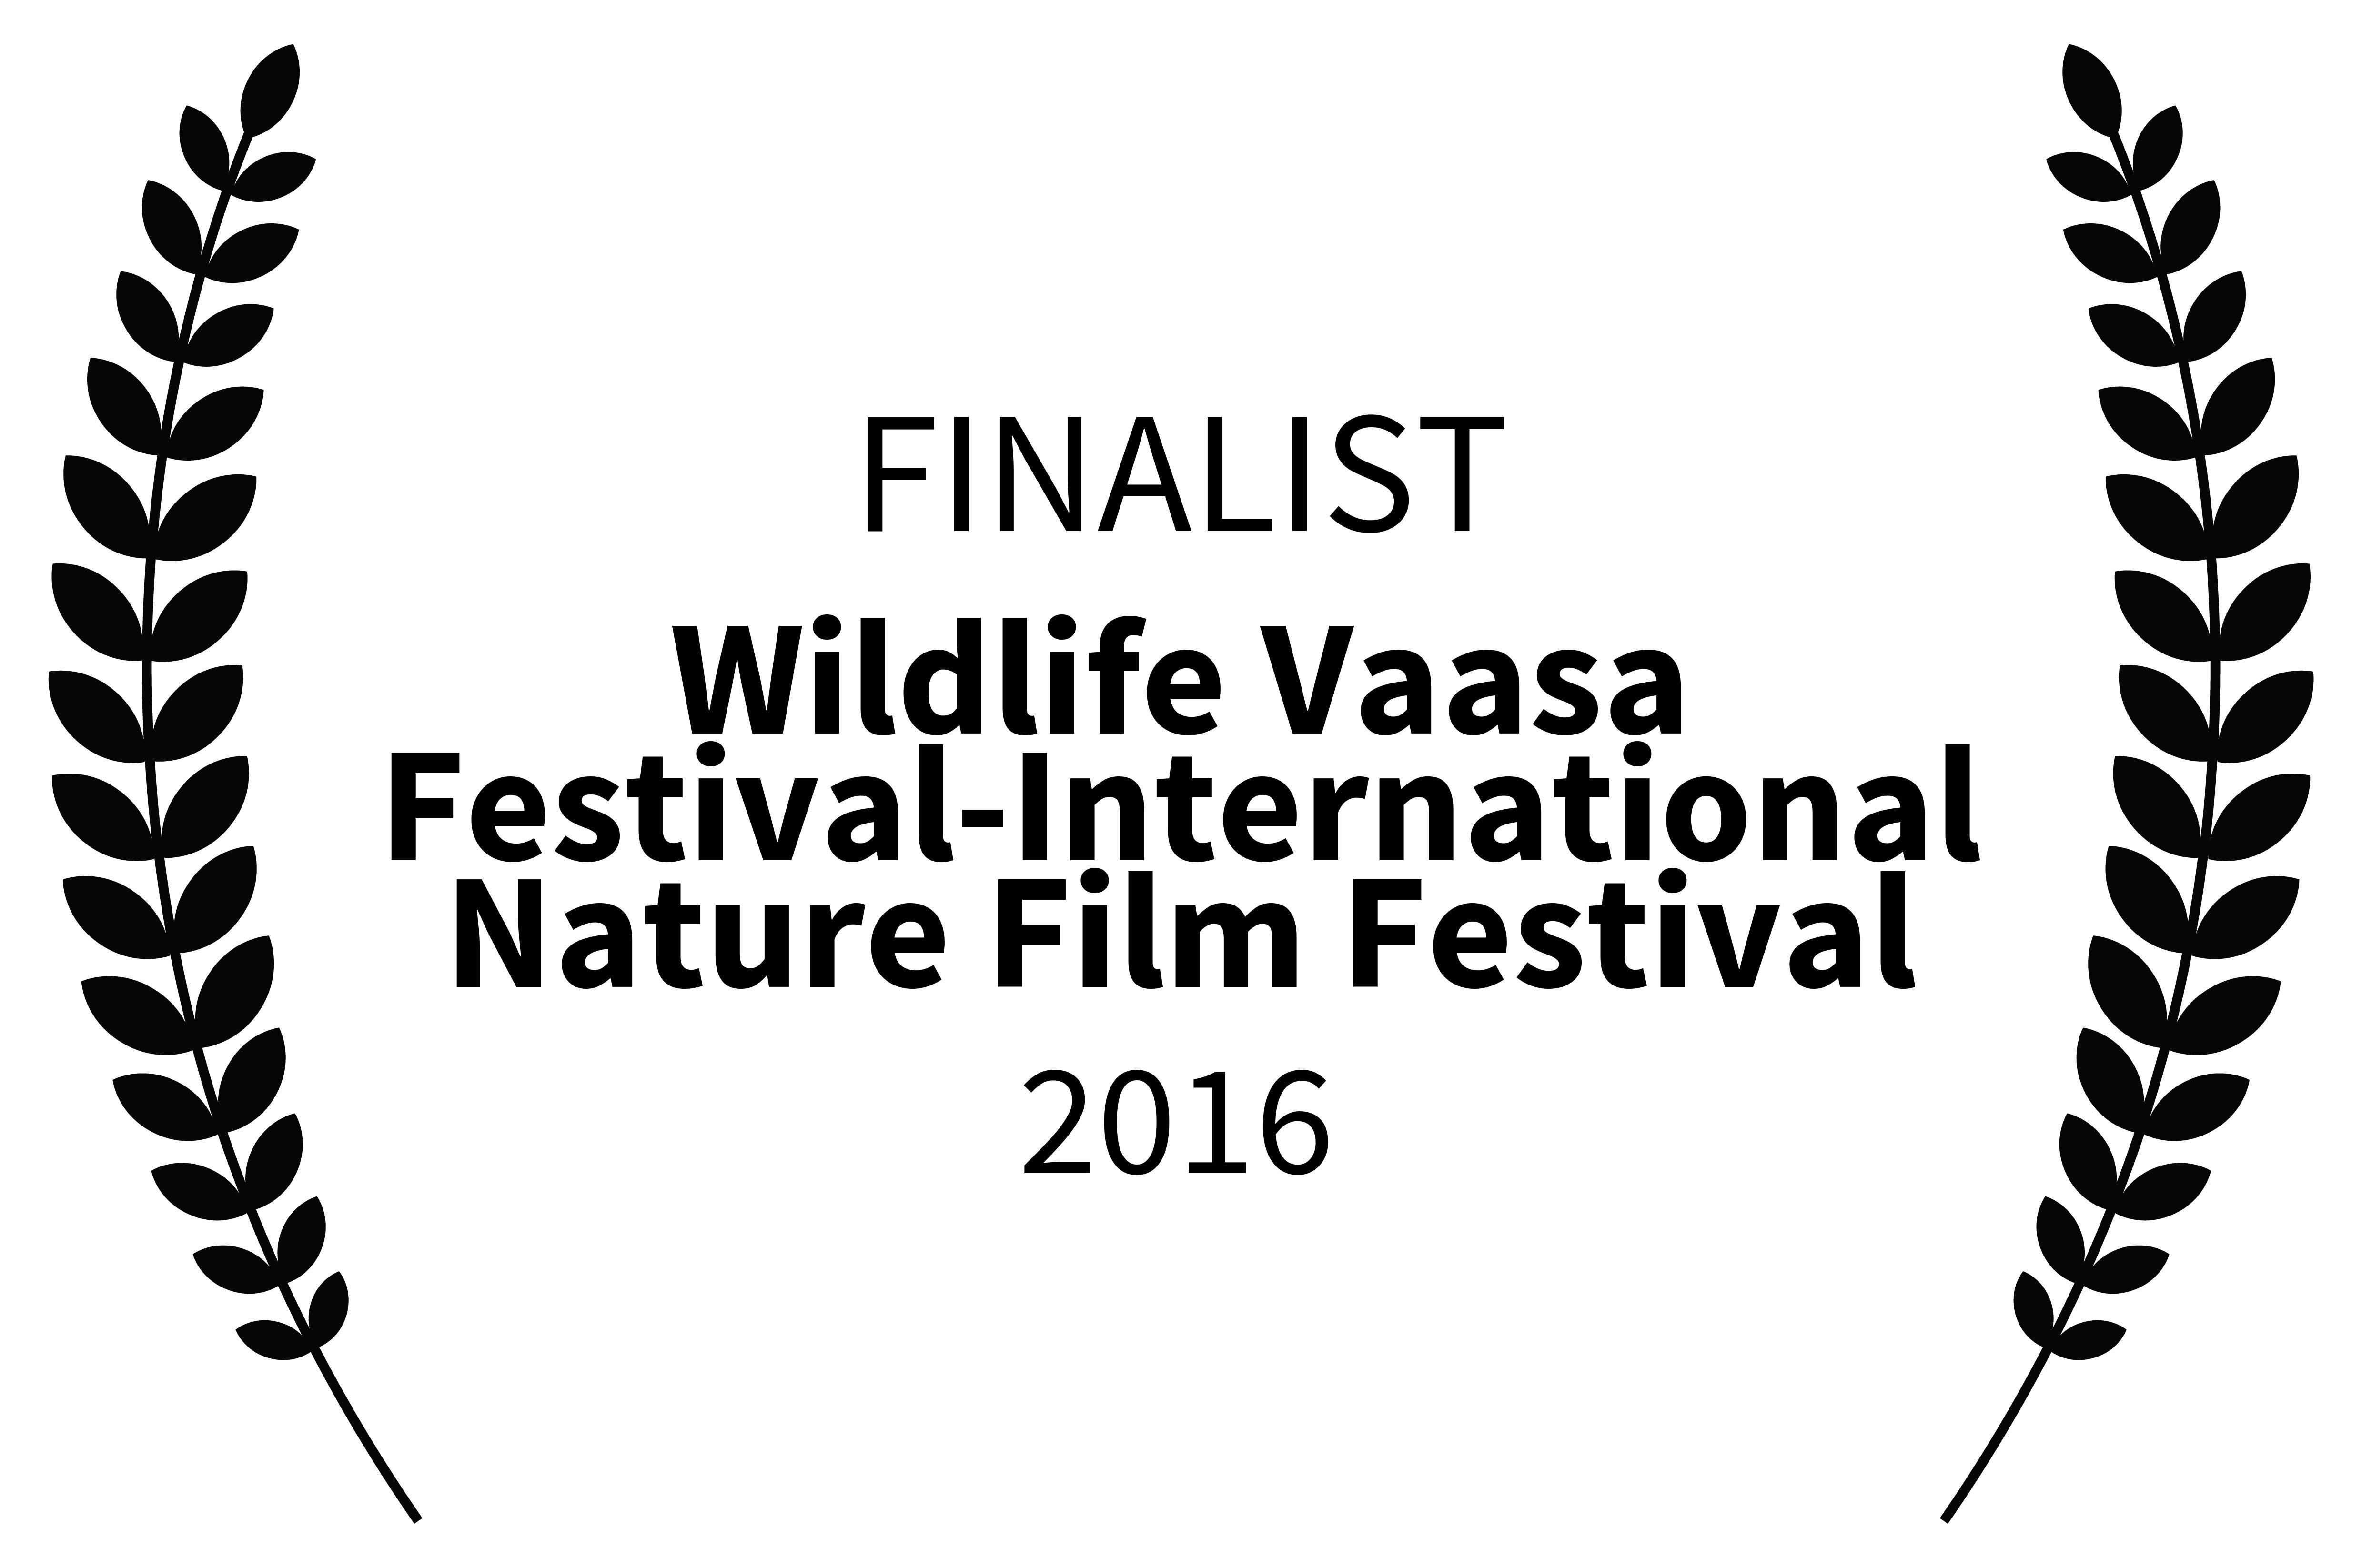 http://tanyacochrane.co.uk/wp-content/uploads/2018/02/FINALIST-WildlifeVaasaFestival-InternationalNatureFilmFestival-20162.jpg